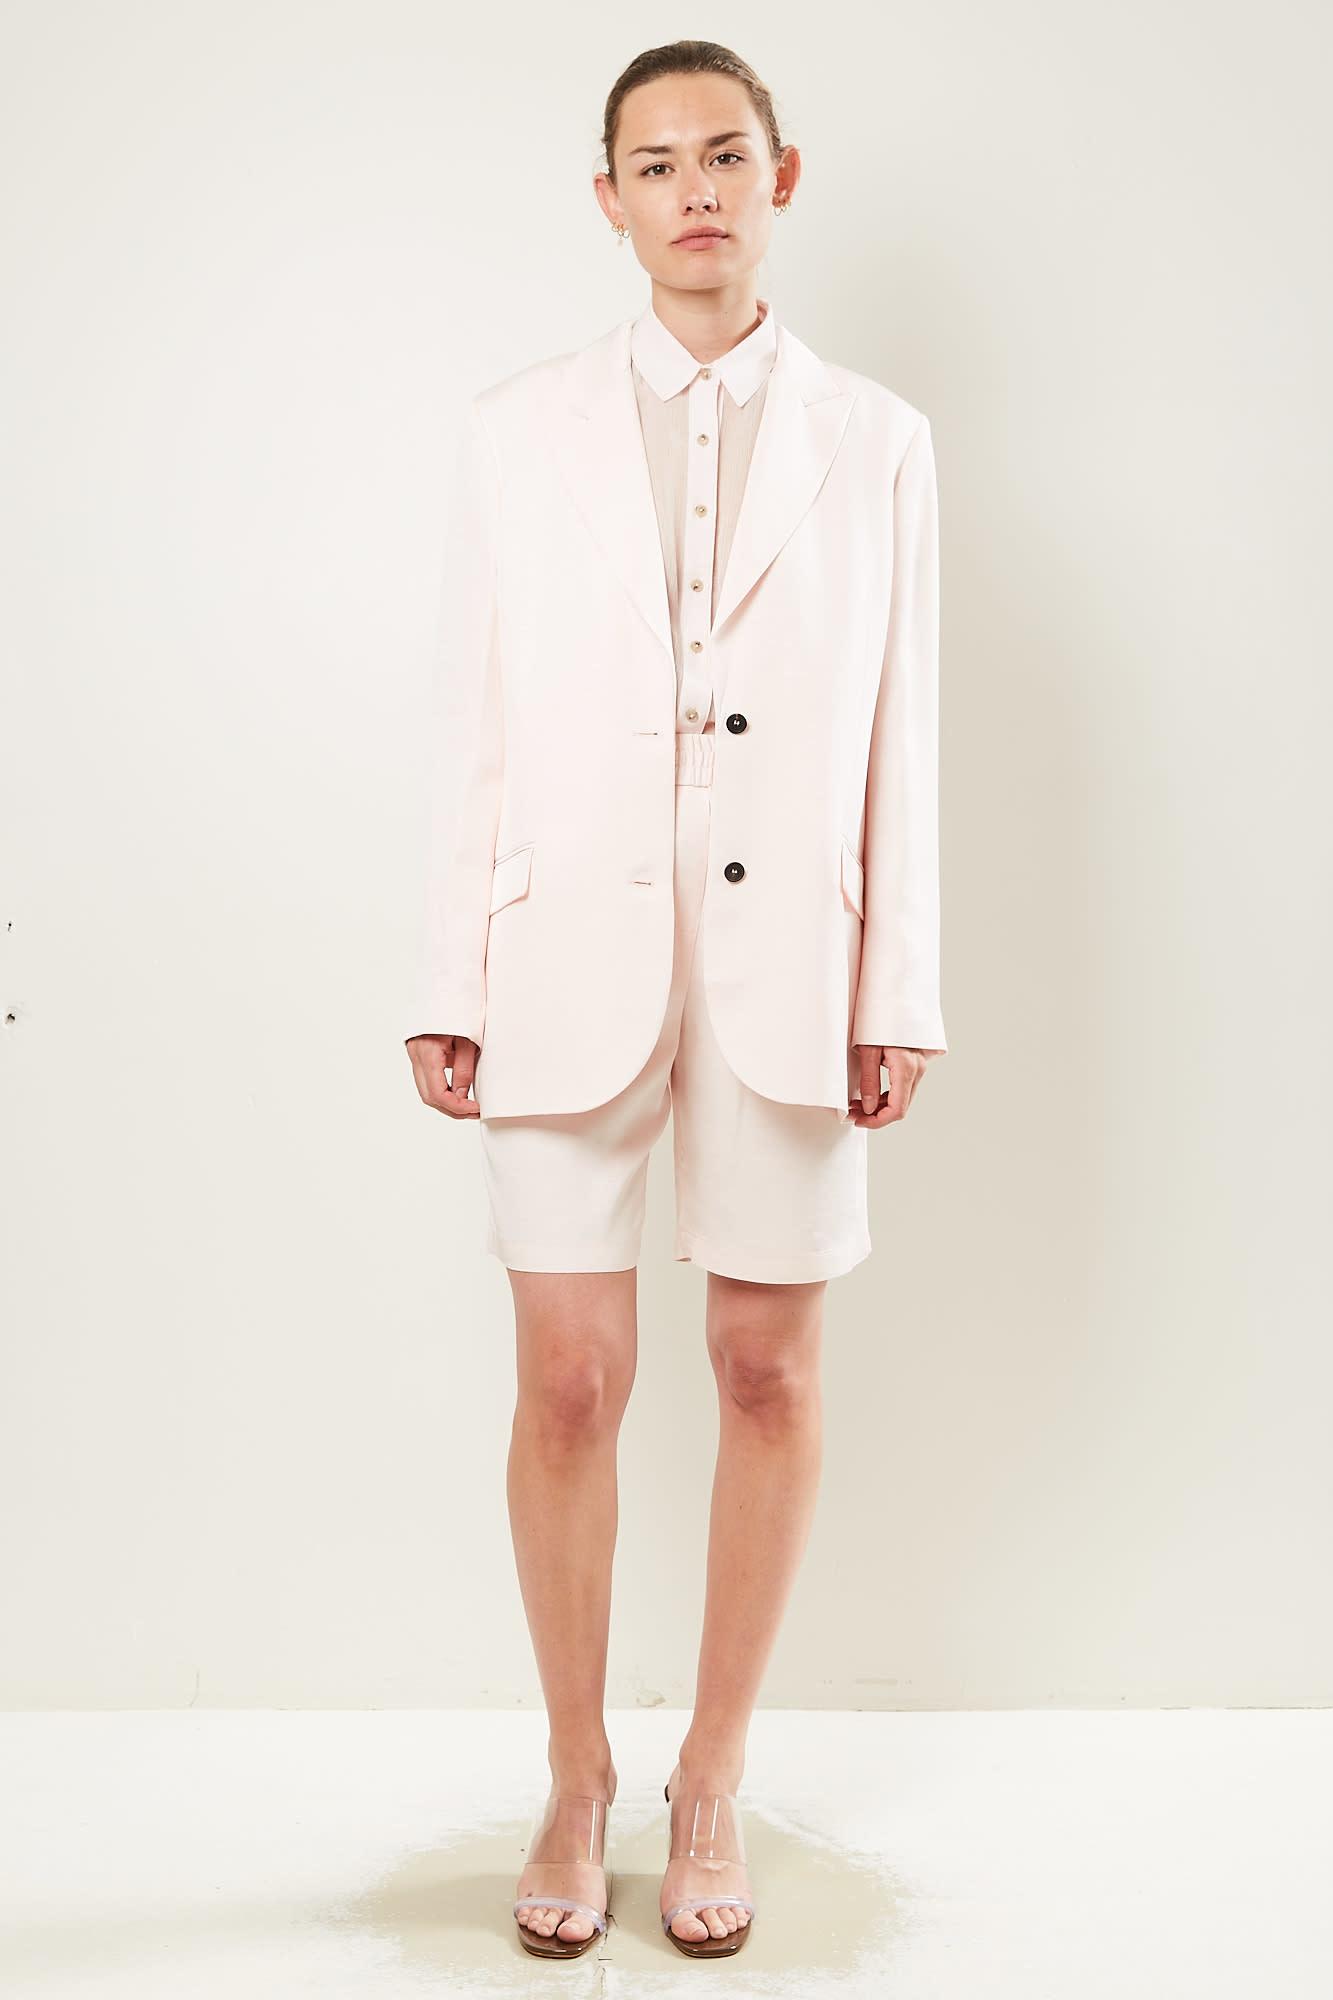 Frenken - Base flimsy suiting trousers